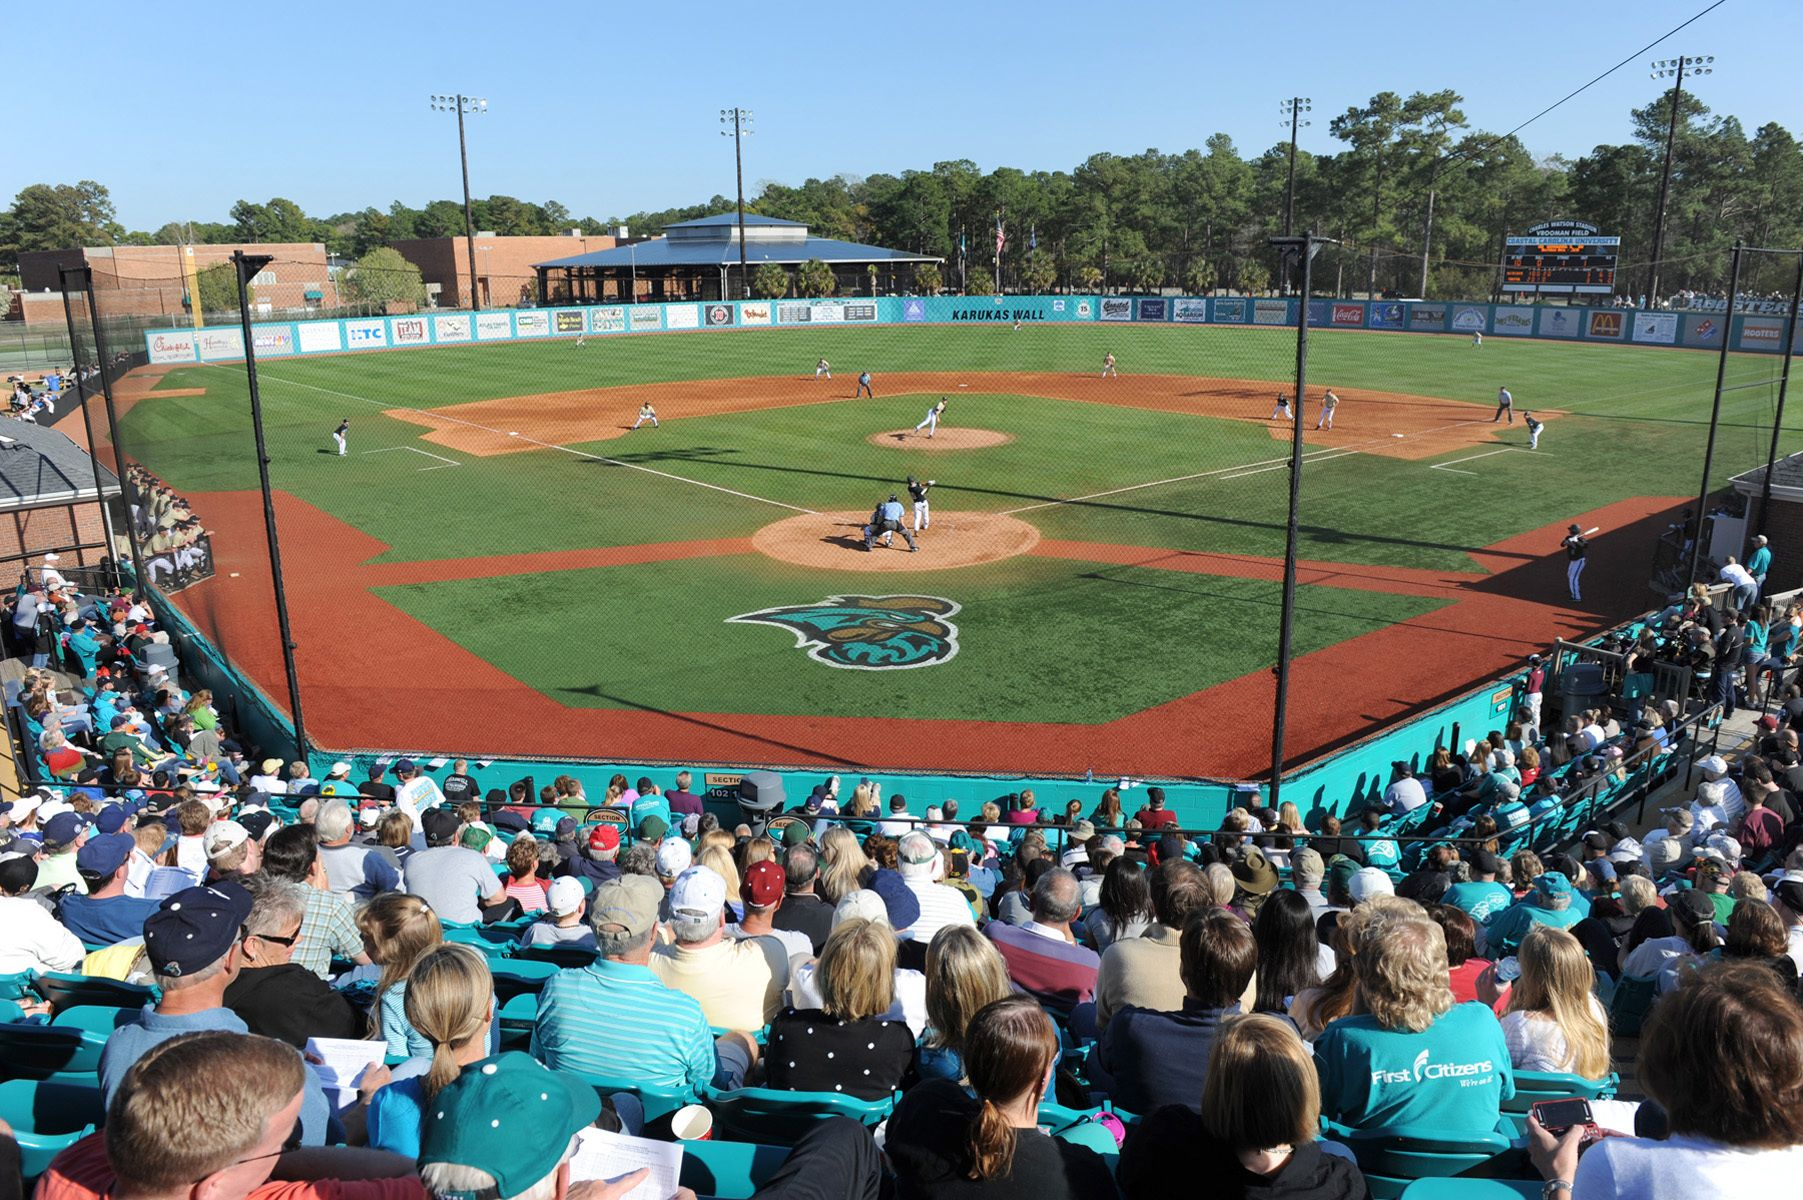 Coastal Carolina Official Athletic Site Facilities Coastal Carolina Coastal Carolina University Coastal